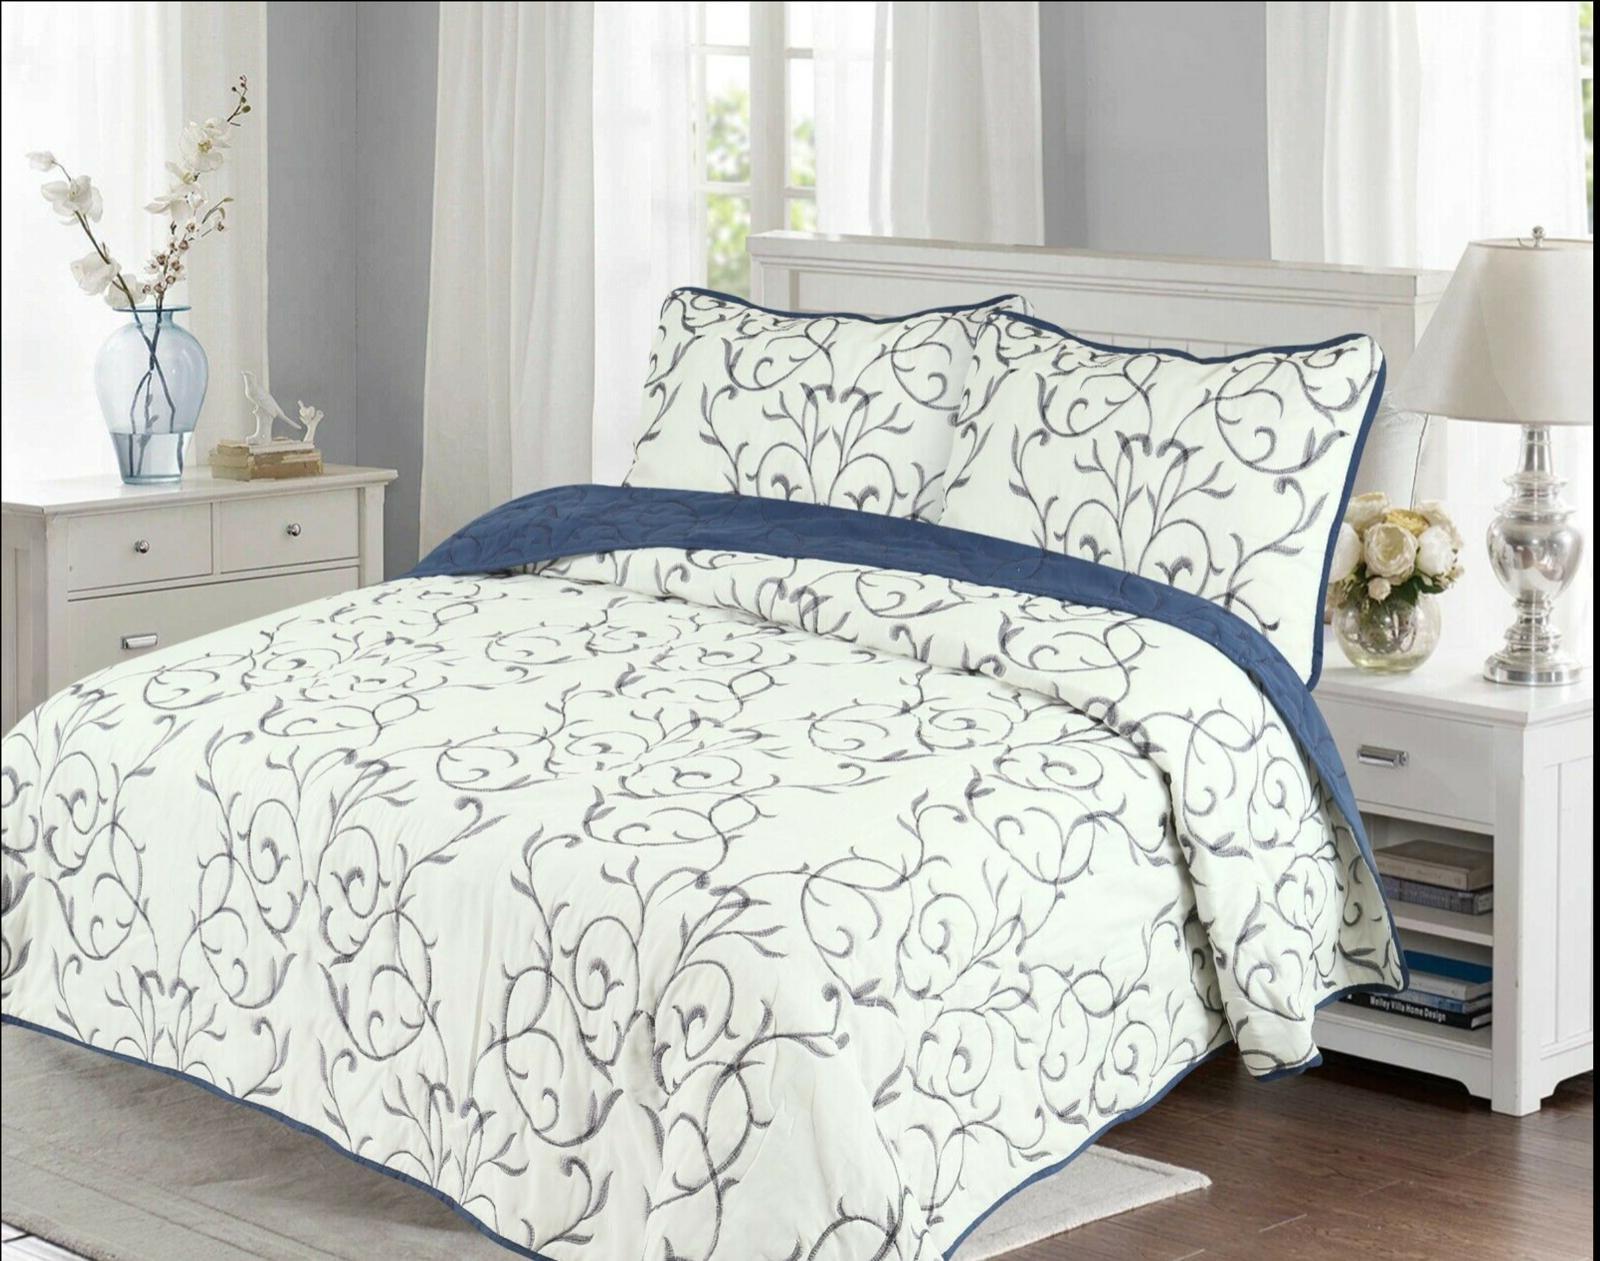 embroidered cotton blend soft reversible bedding bedspread